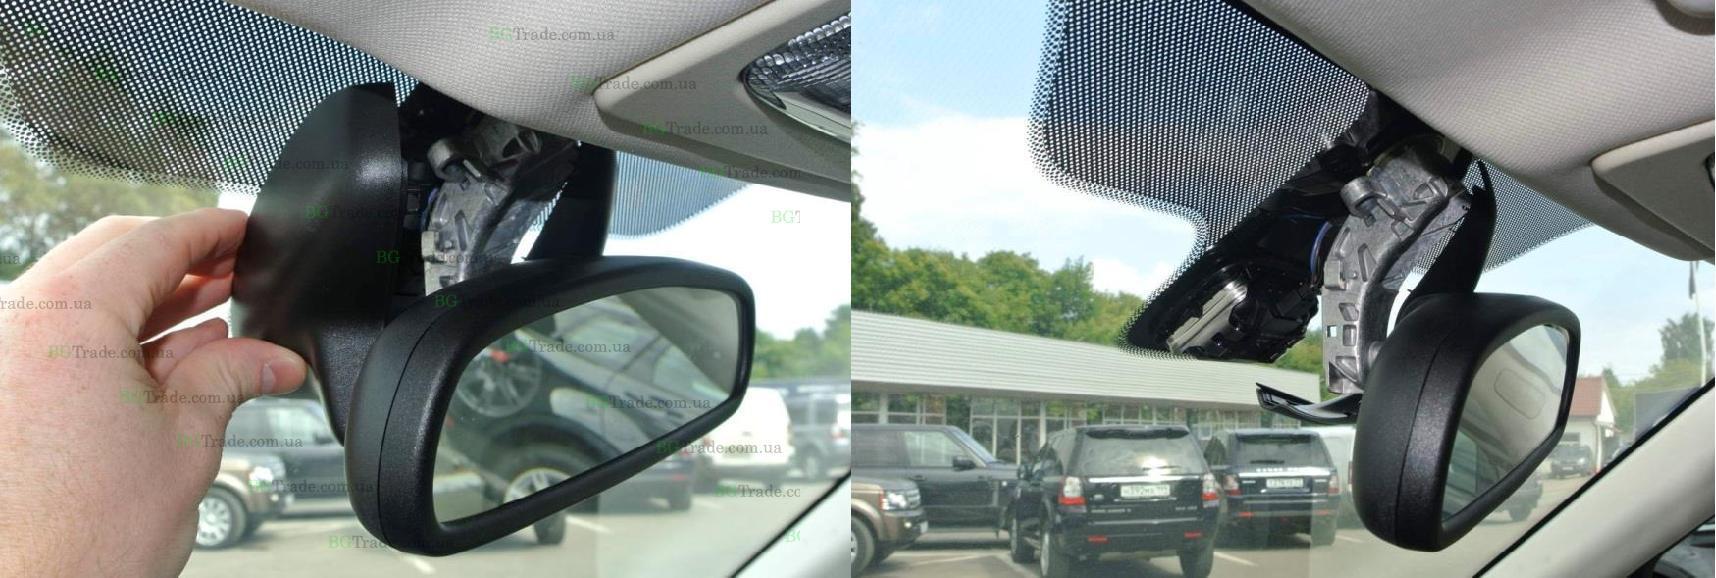 Установка зеркала видеорегистратора на Land Rover